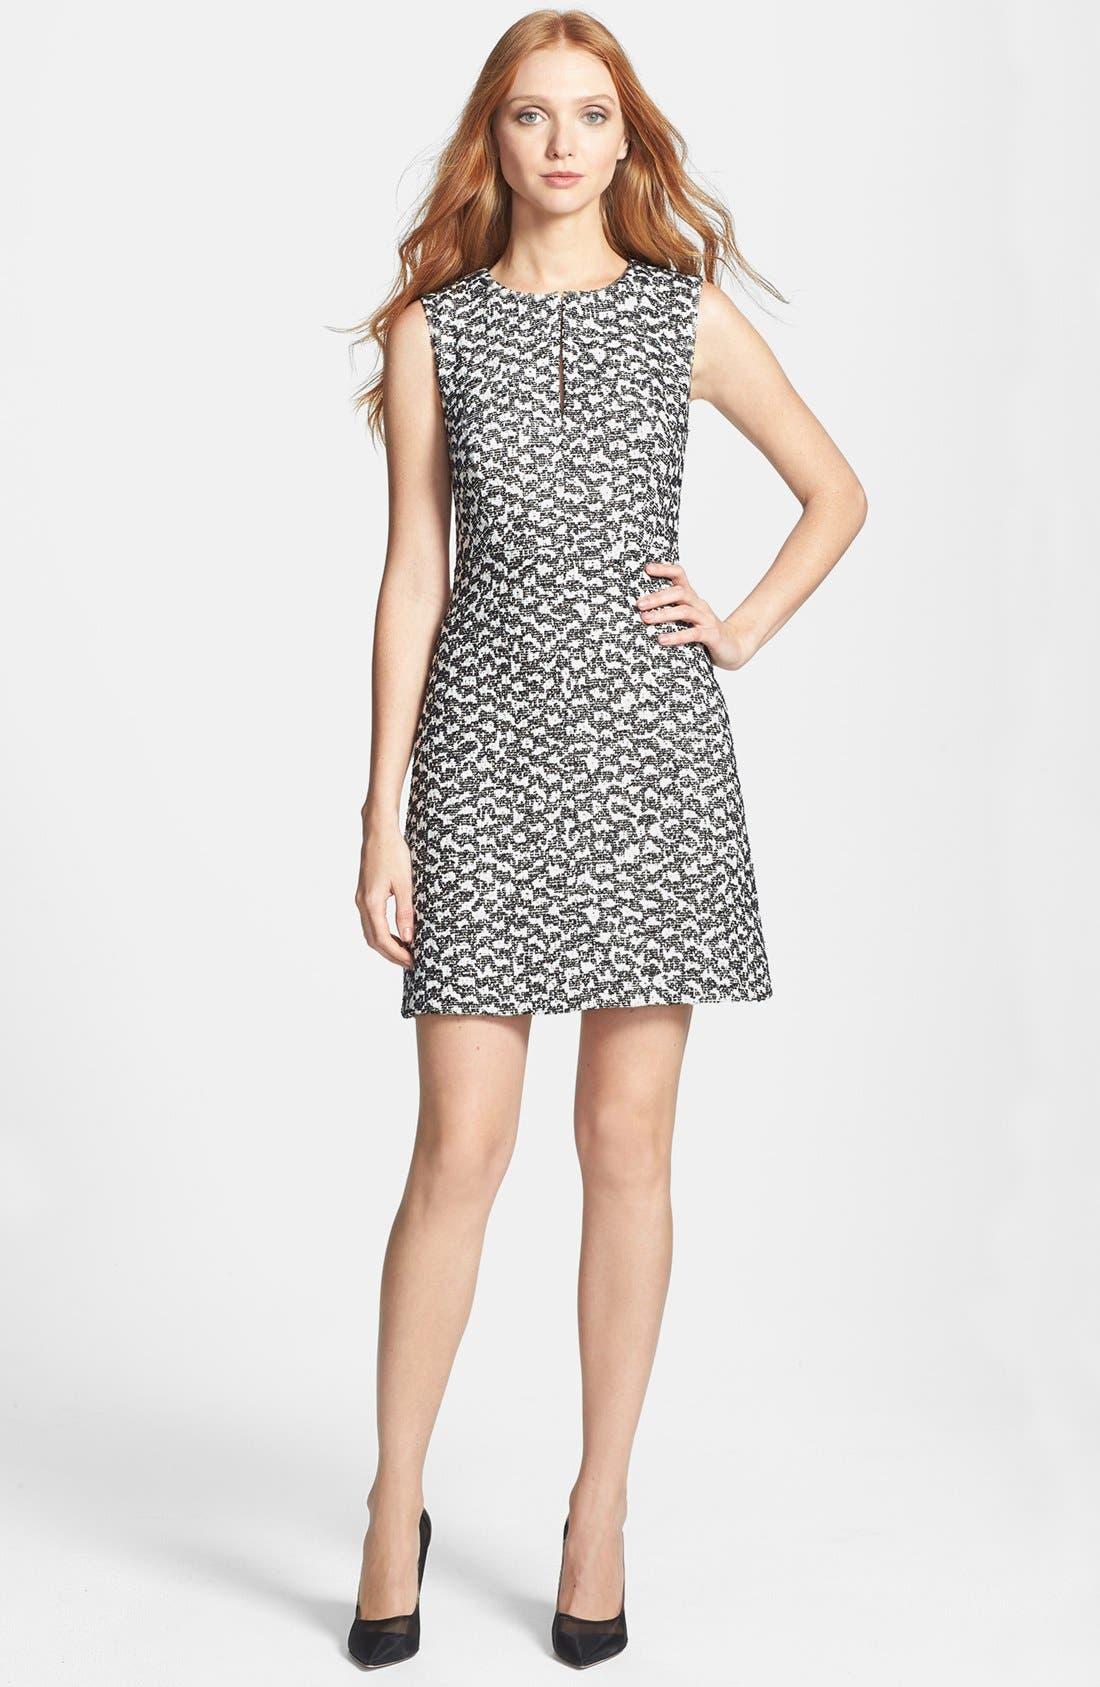 Alternate Image 1 Selected - Diane von Furstenberg 'Yvette' Cotton Blend A-Line Dress